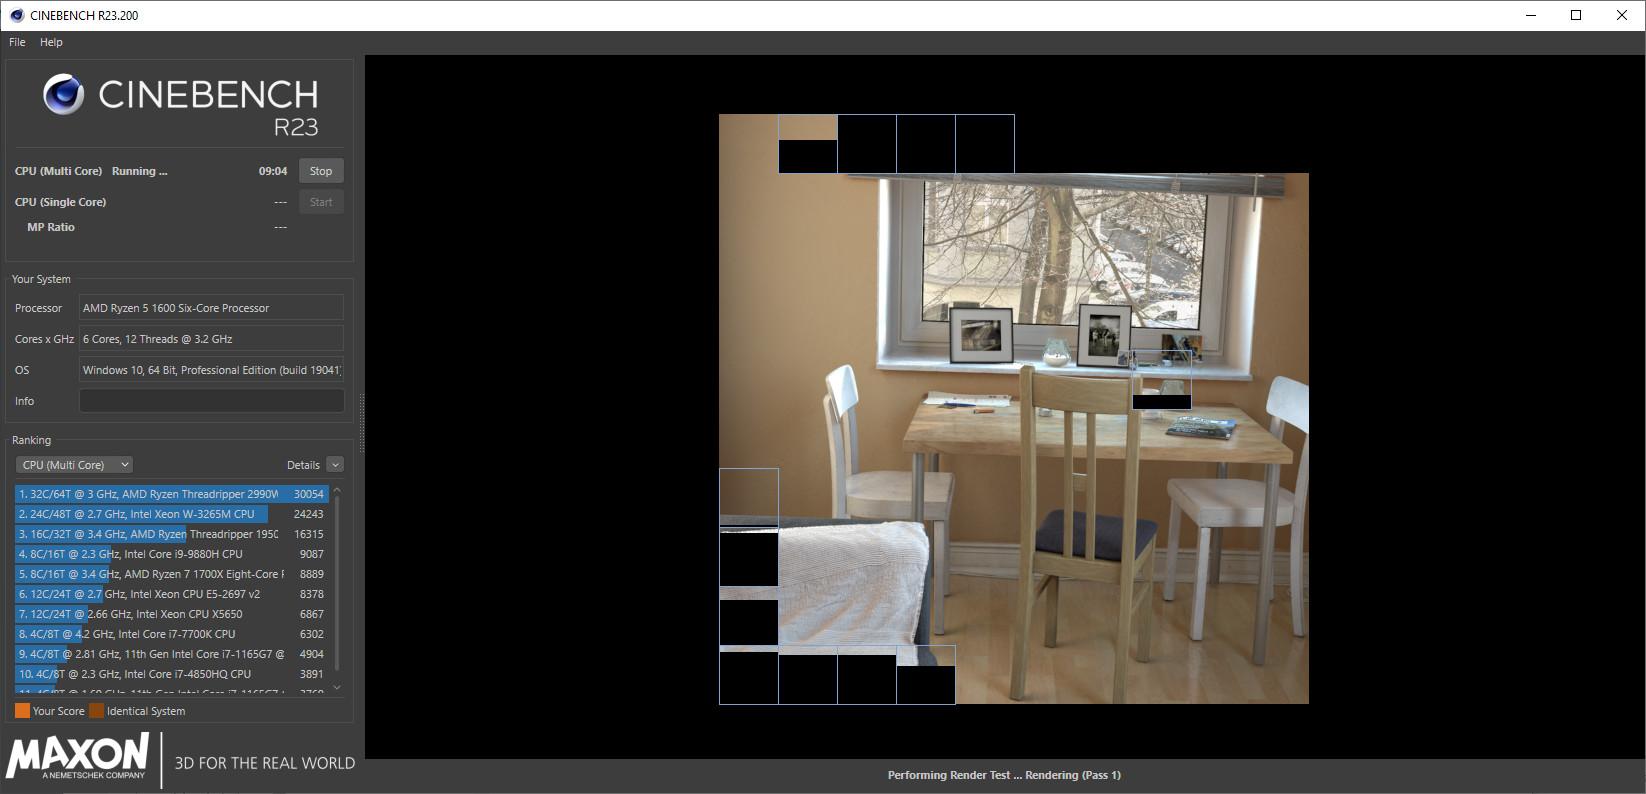 Screenshot 1 - Cinebench